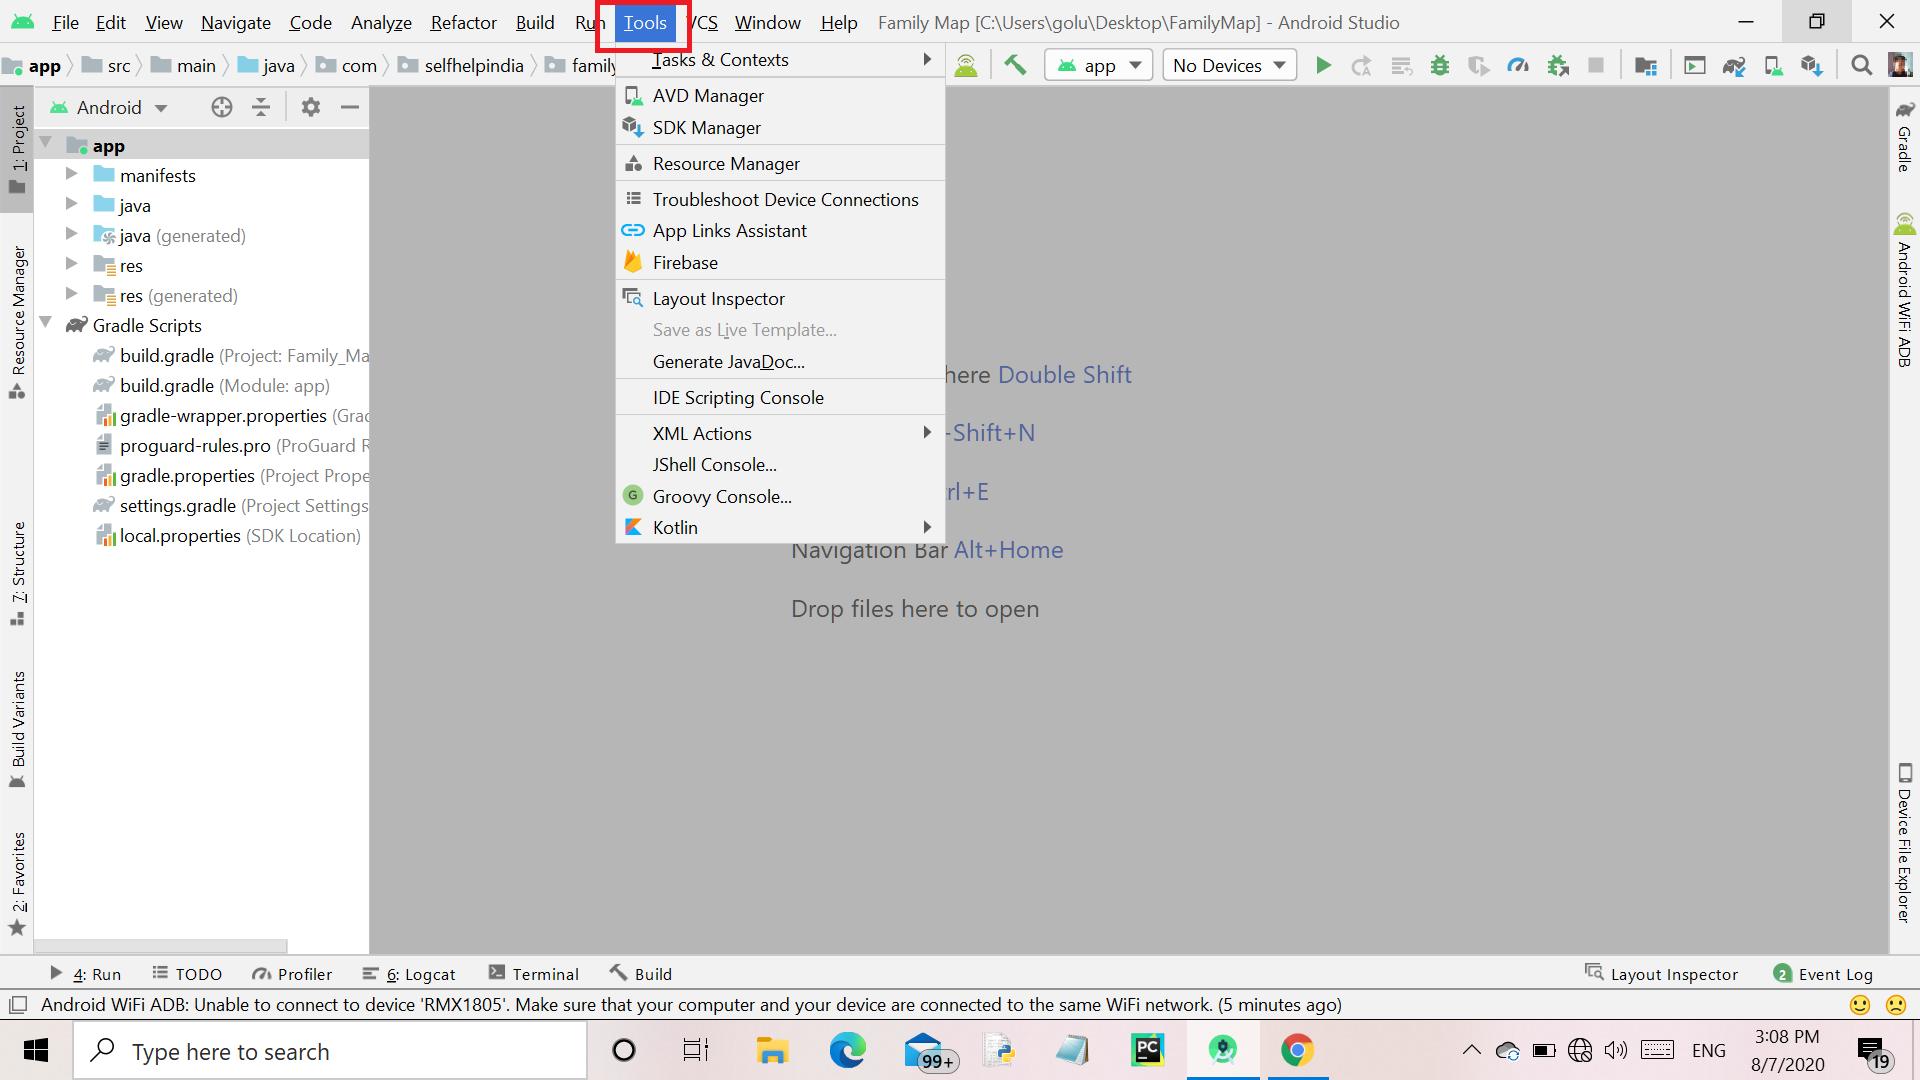 tools menu button